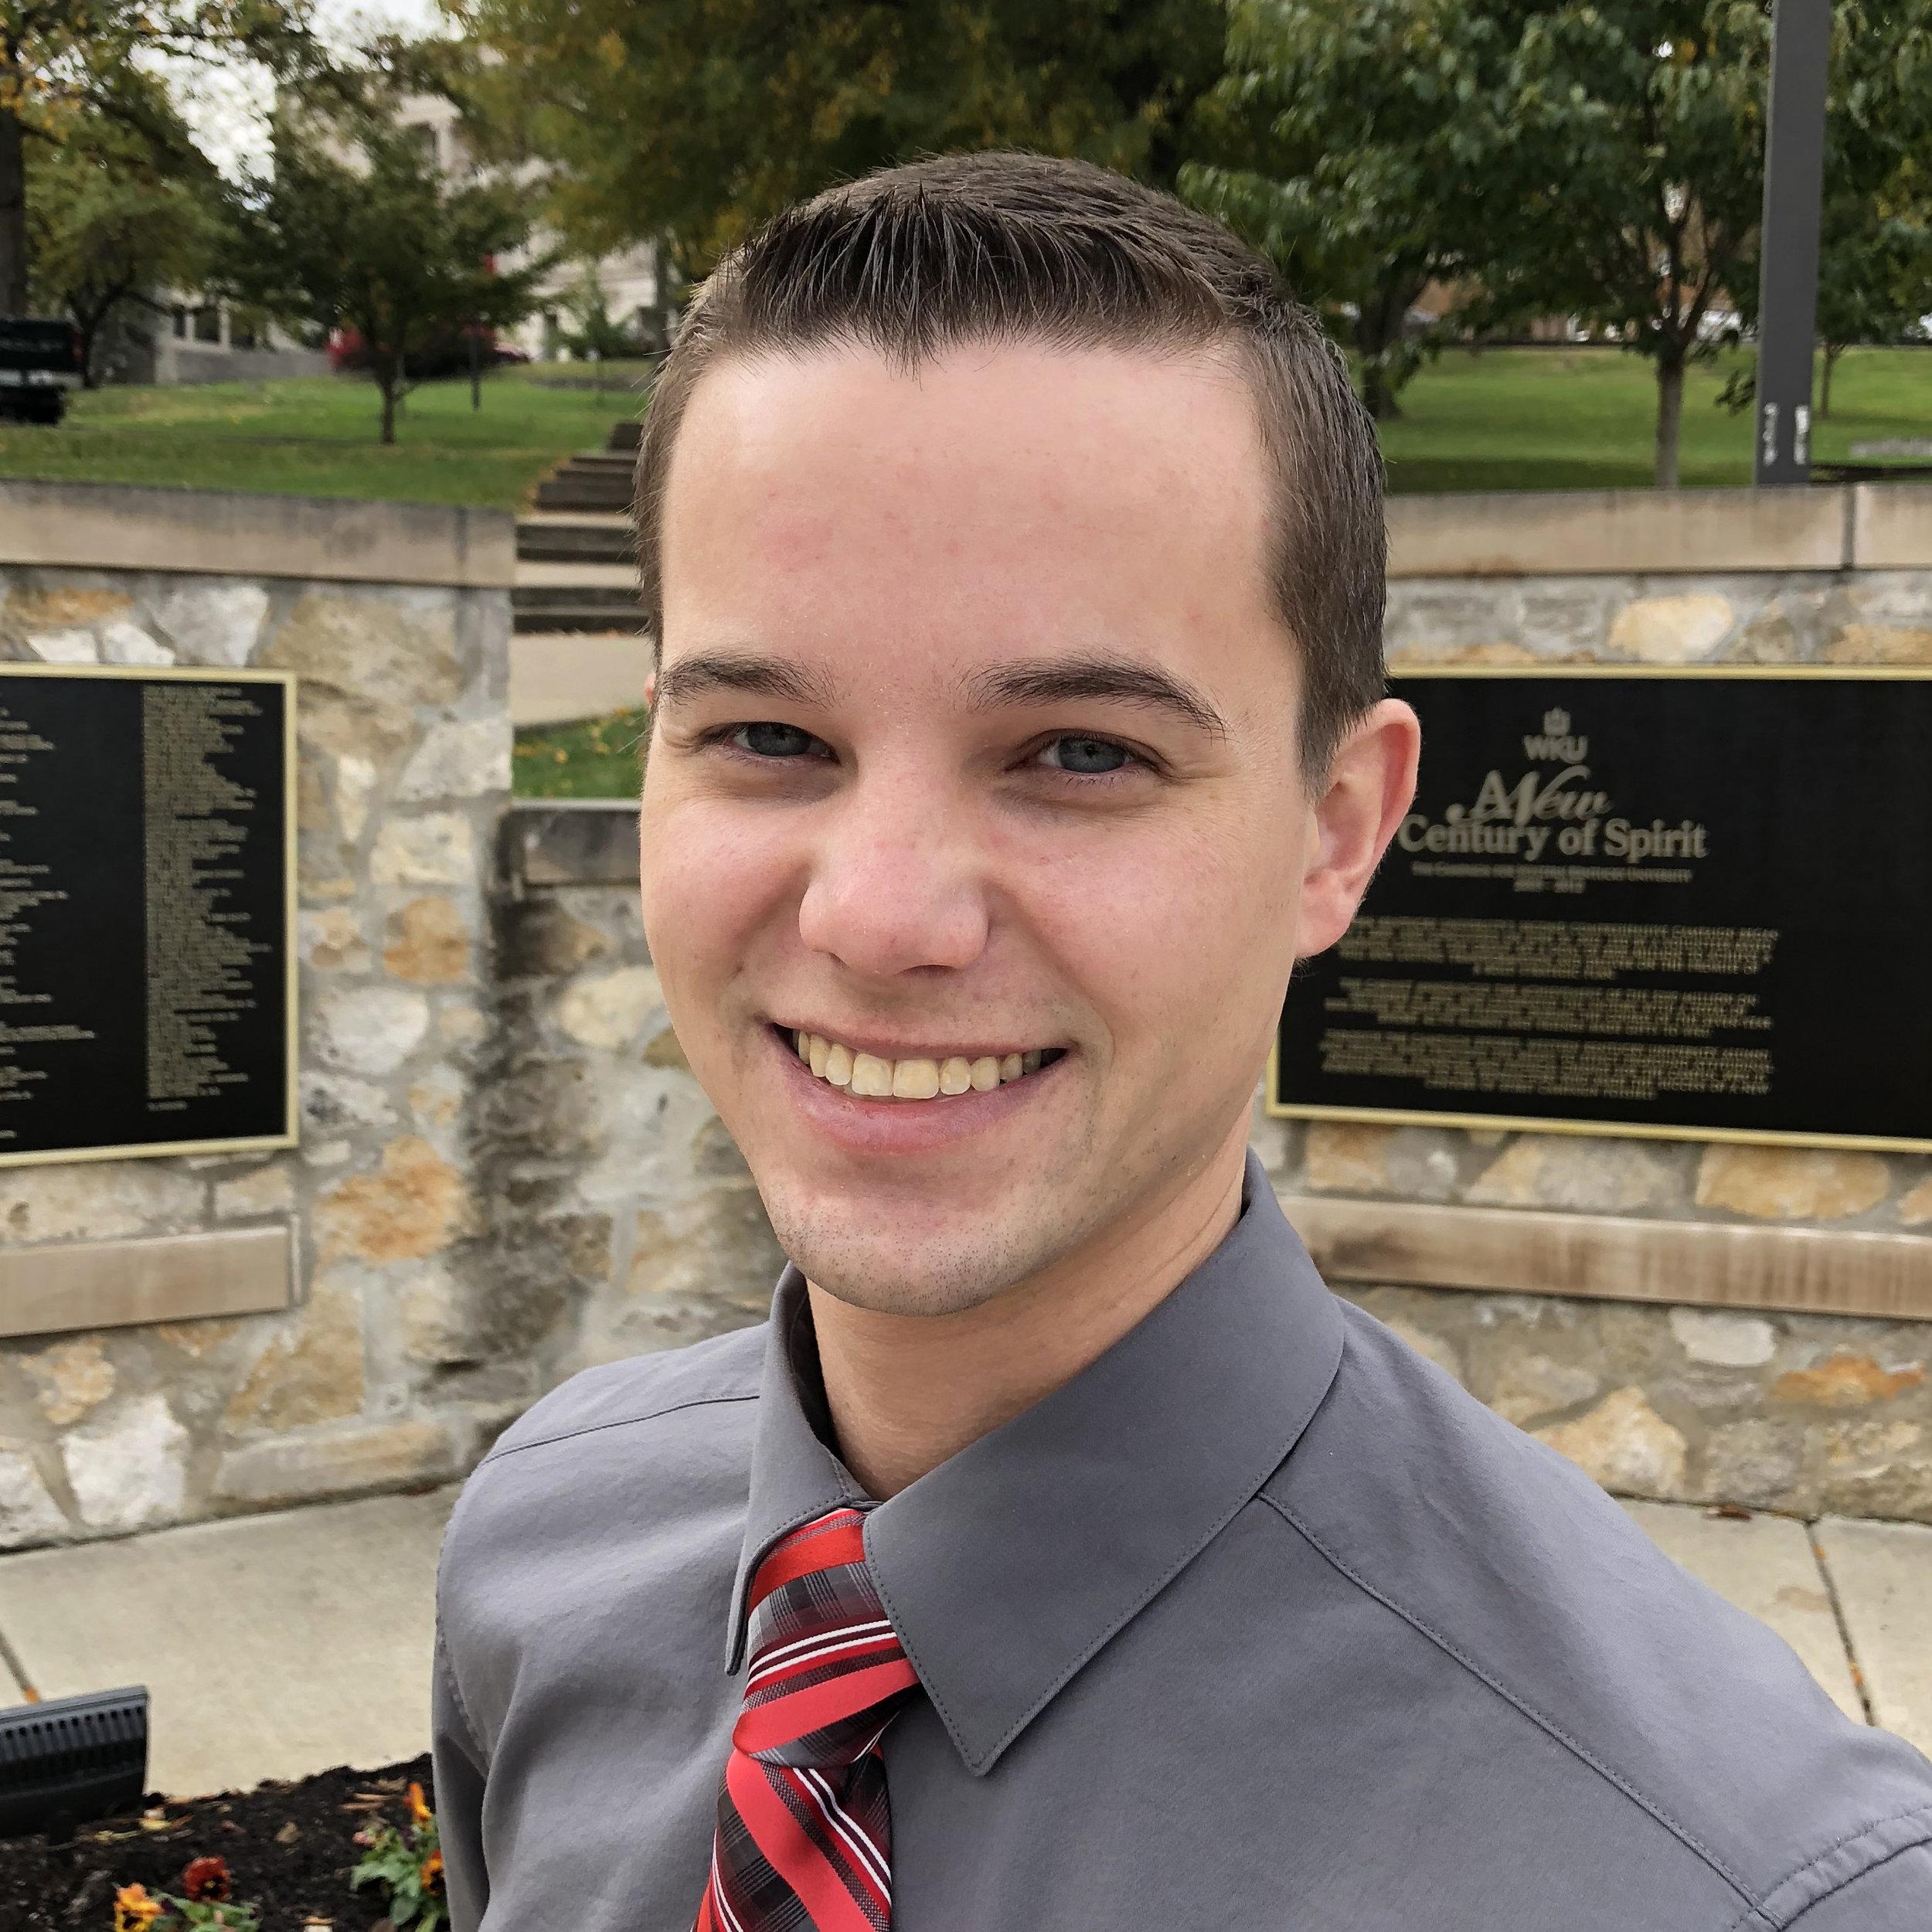 Andrew Gilliam, ITS Service Desk Consultant